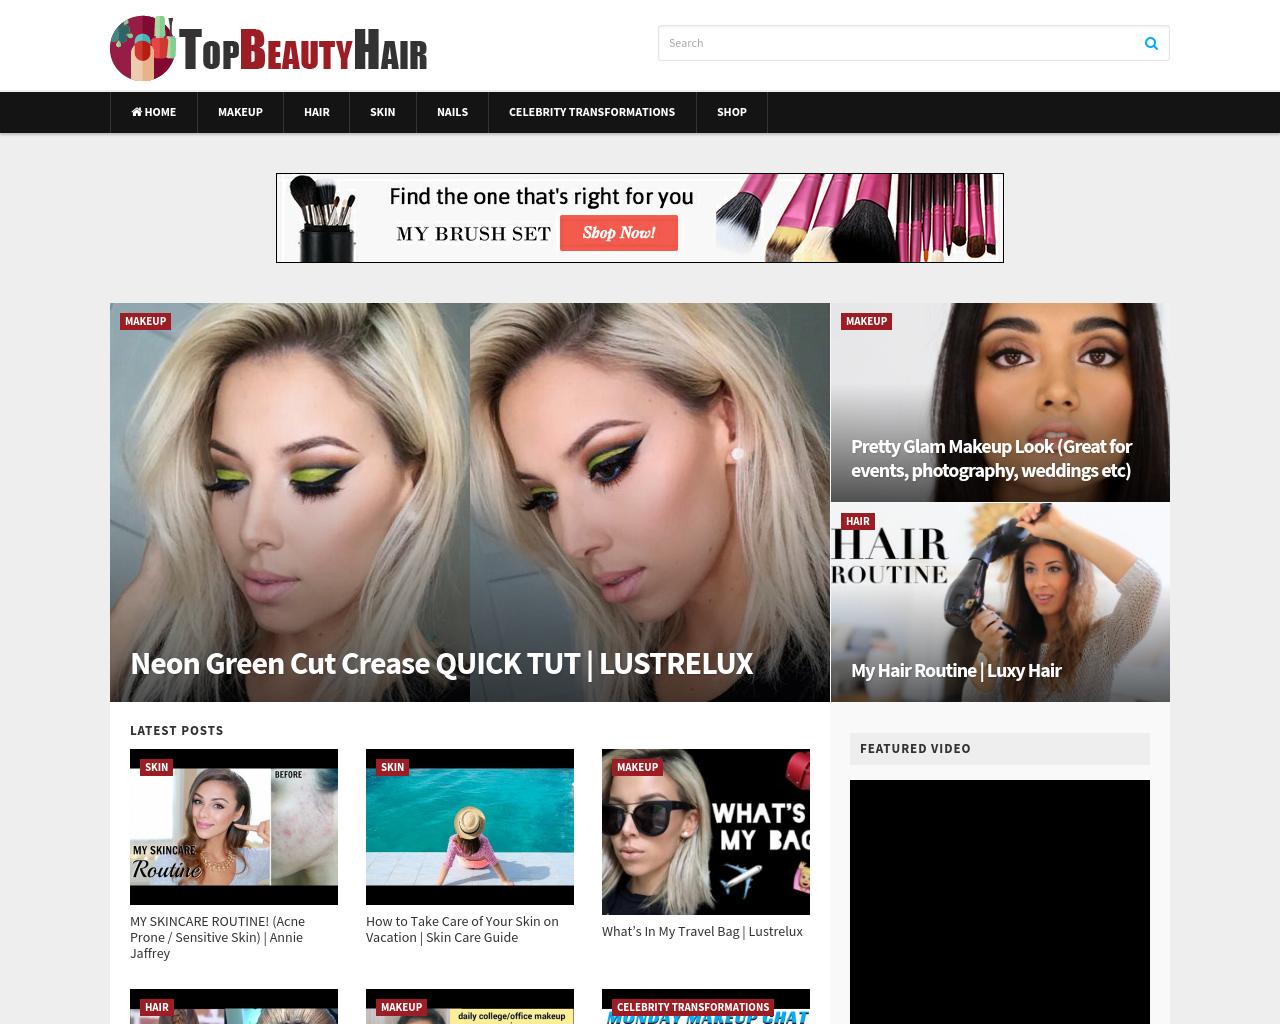 Top-Beauty-Hair-Advertising-Reviews-Pricing